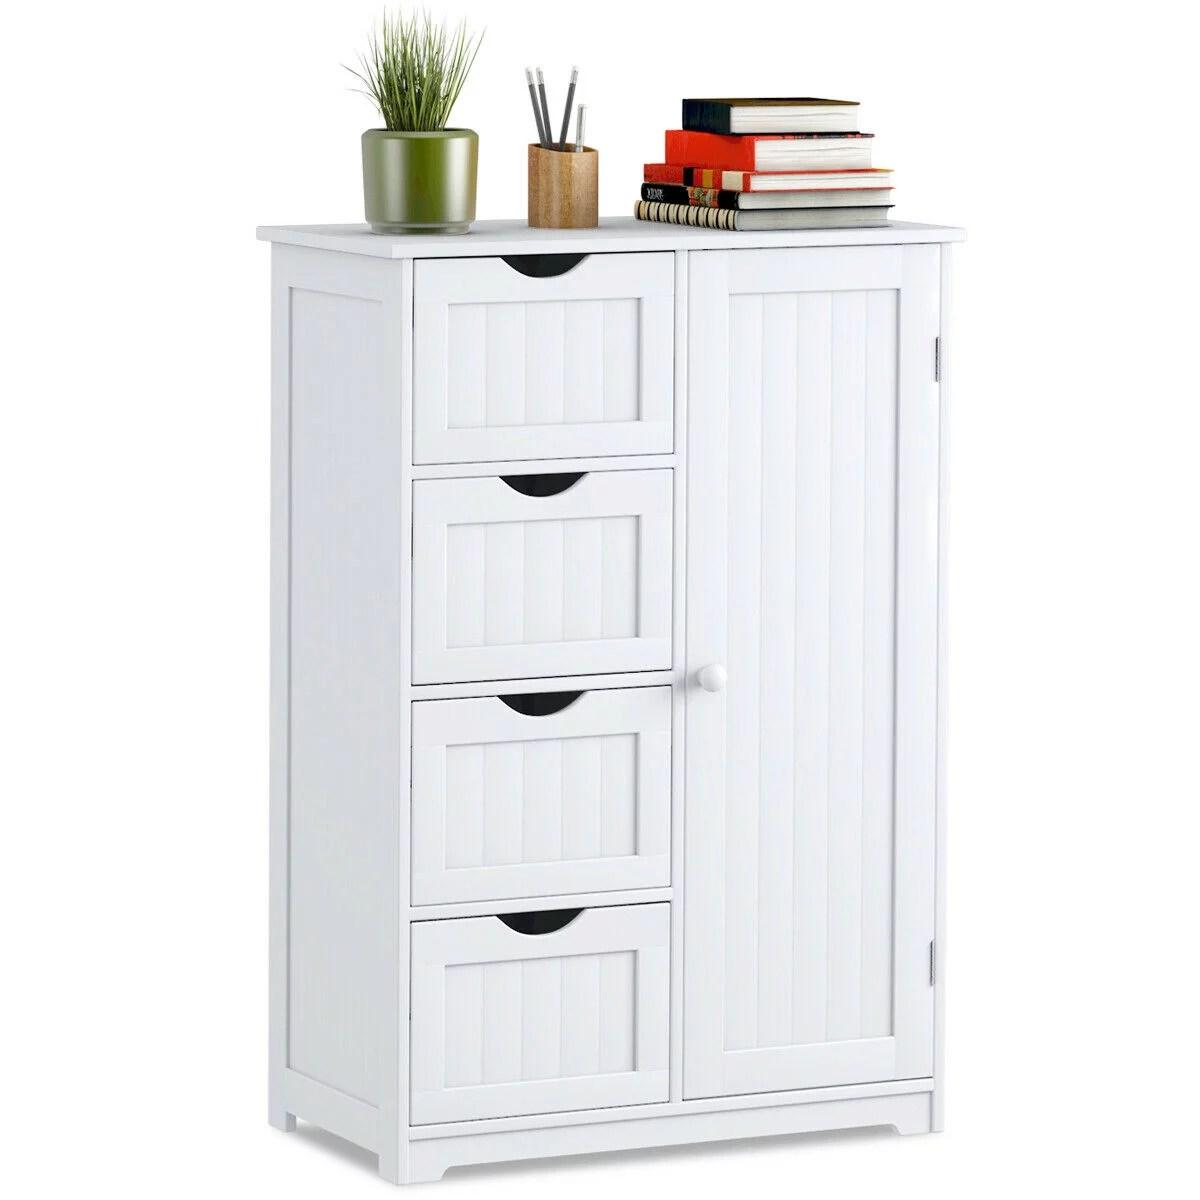 costway wooden 4 drawer bathroom cabinet storage cupboard 2 shelves free standing white